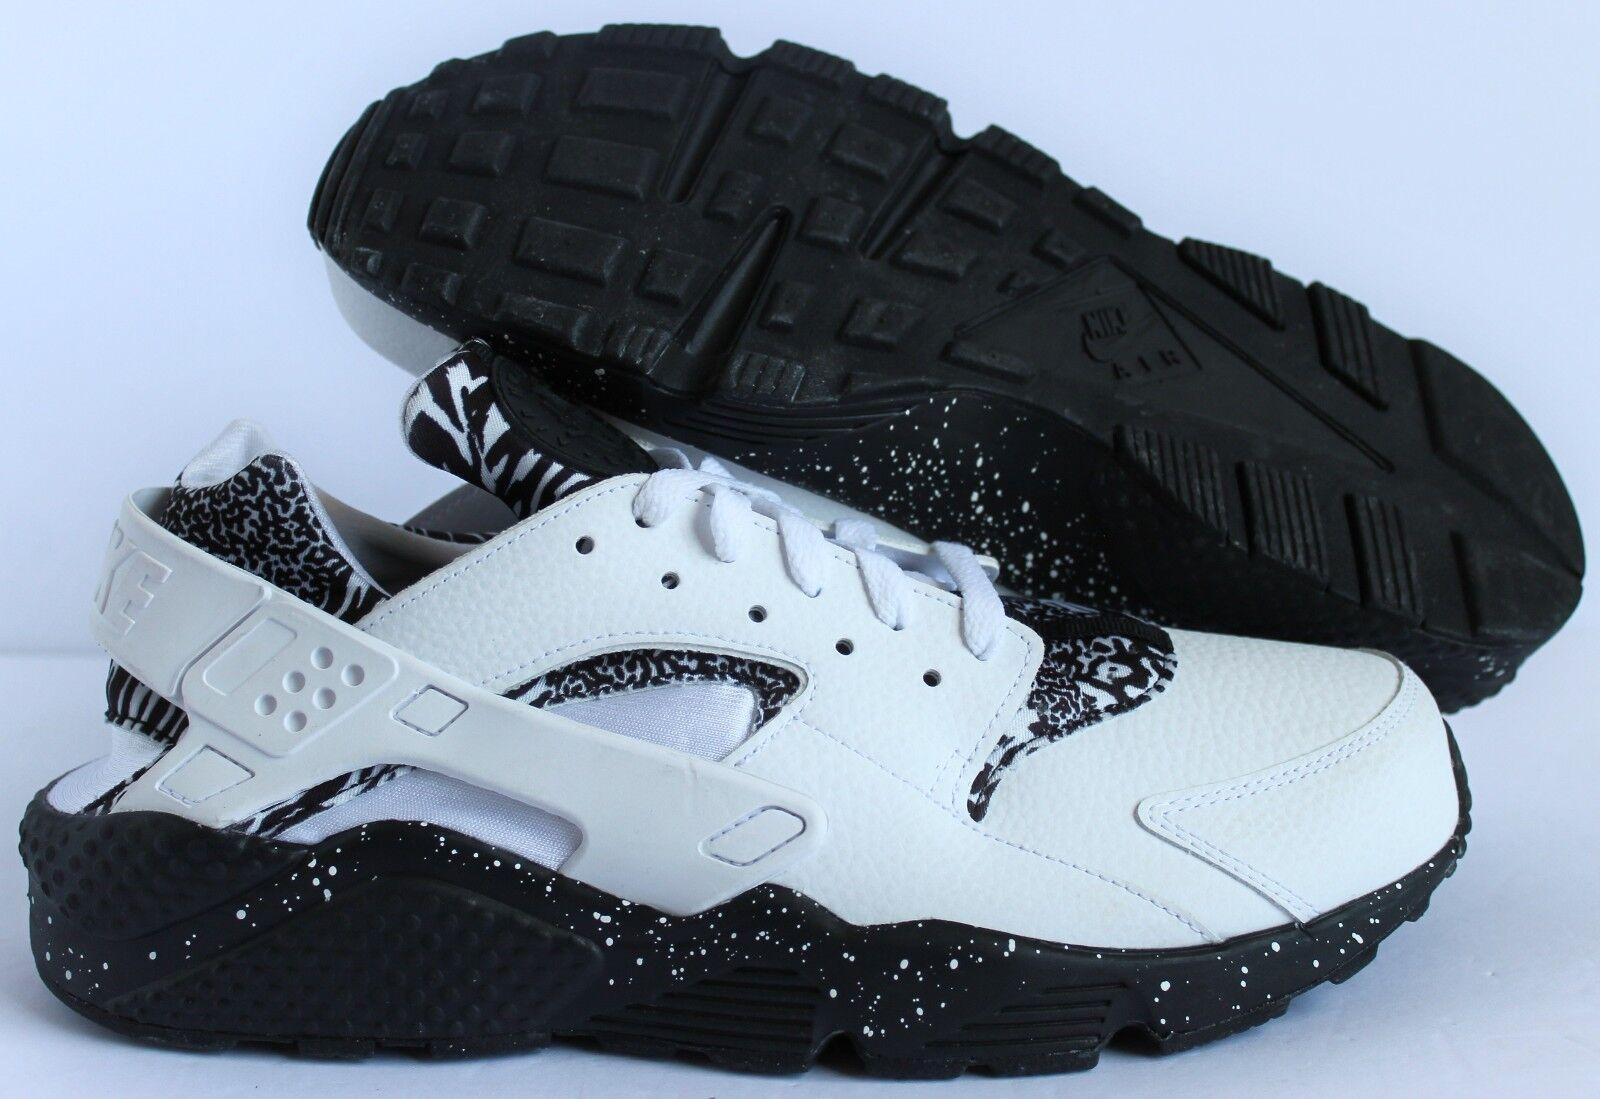 Nike ID DE LOS HOMBRES Huarache Premium ID Nike  blanco o-negro [777330-985] 9d1a9c